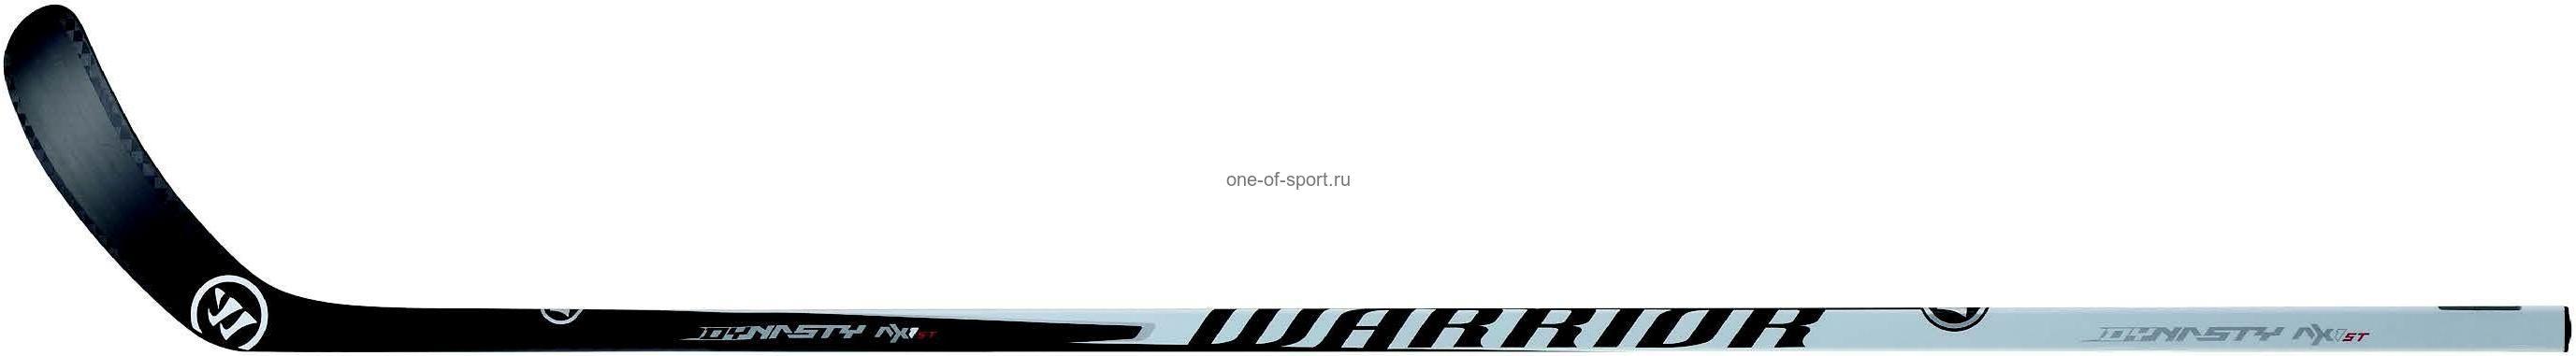 Клюшка хоккейная Warrior AX 1 ST Grip 85 SR